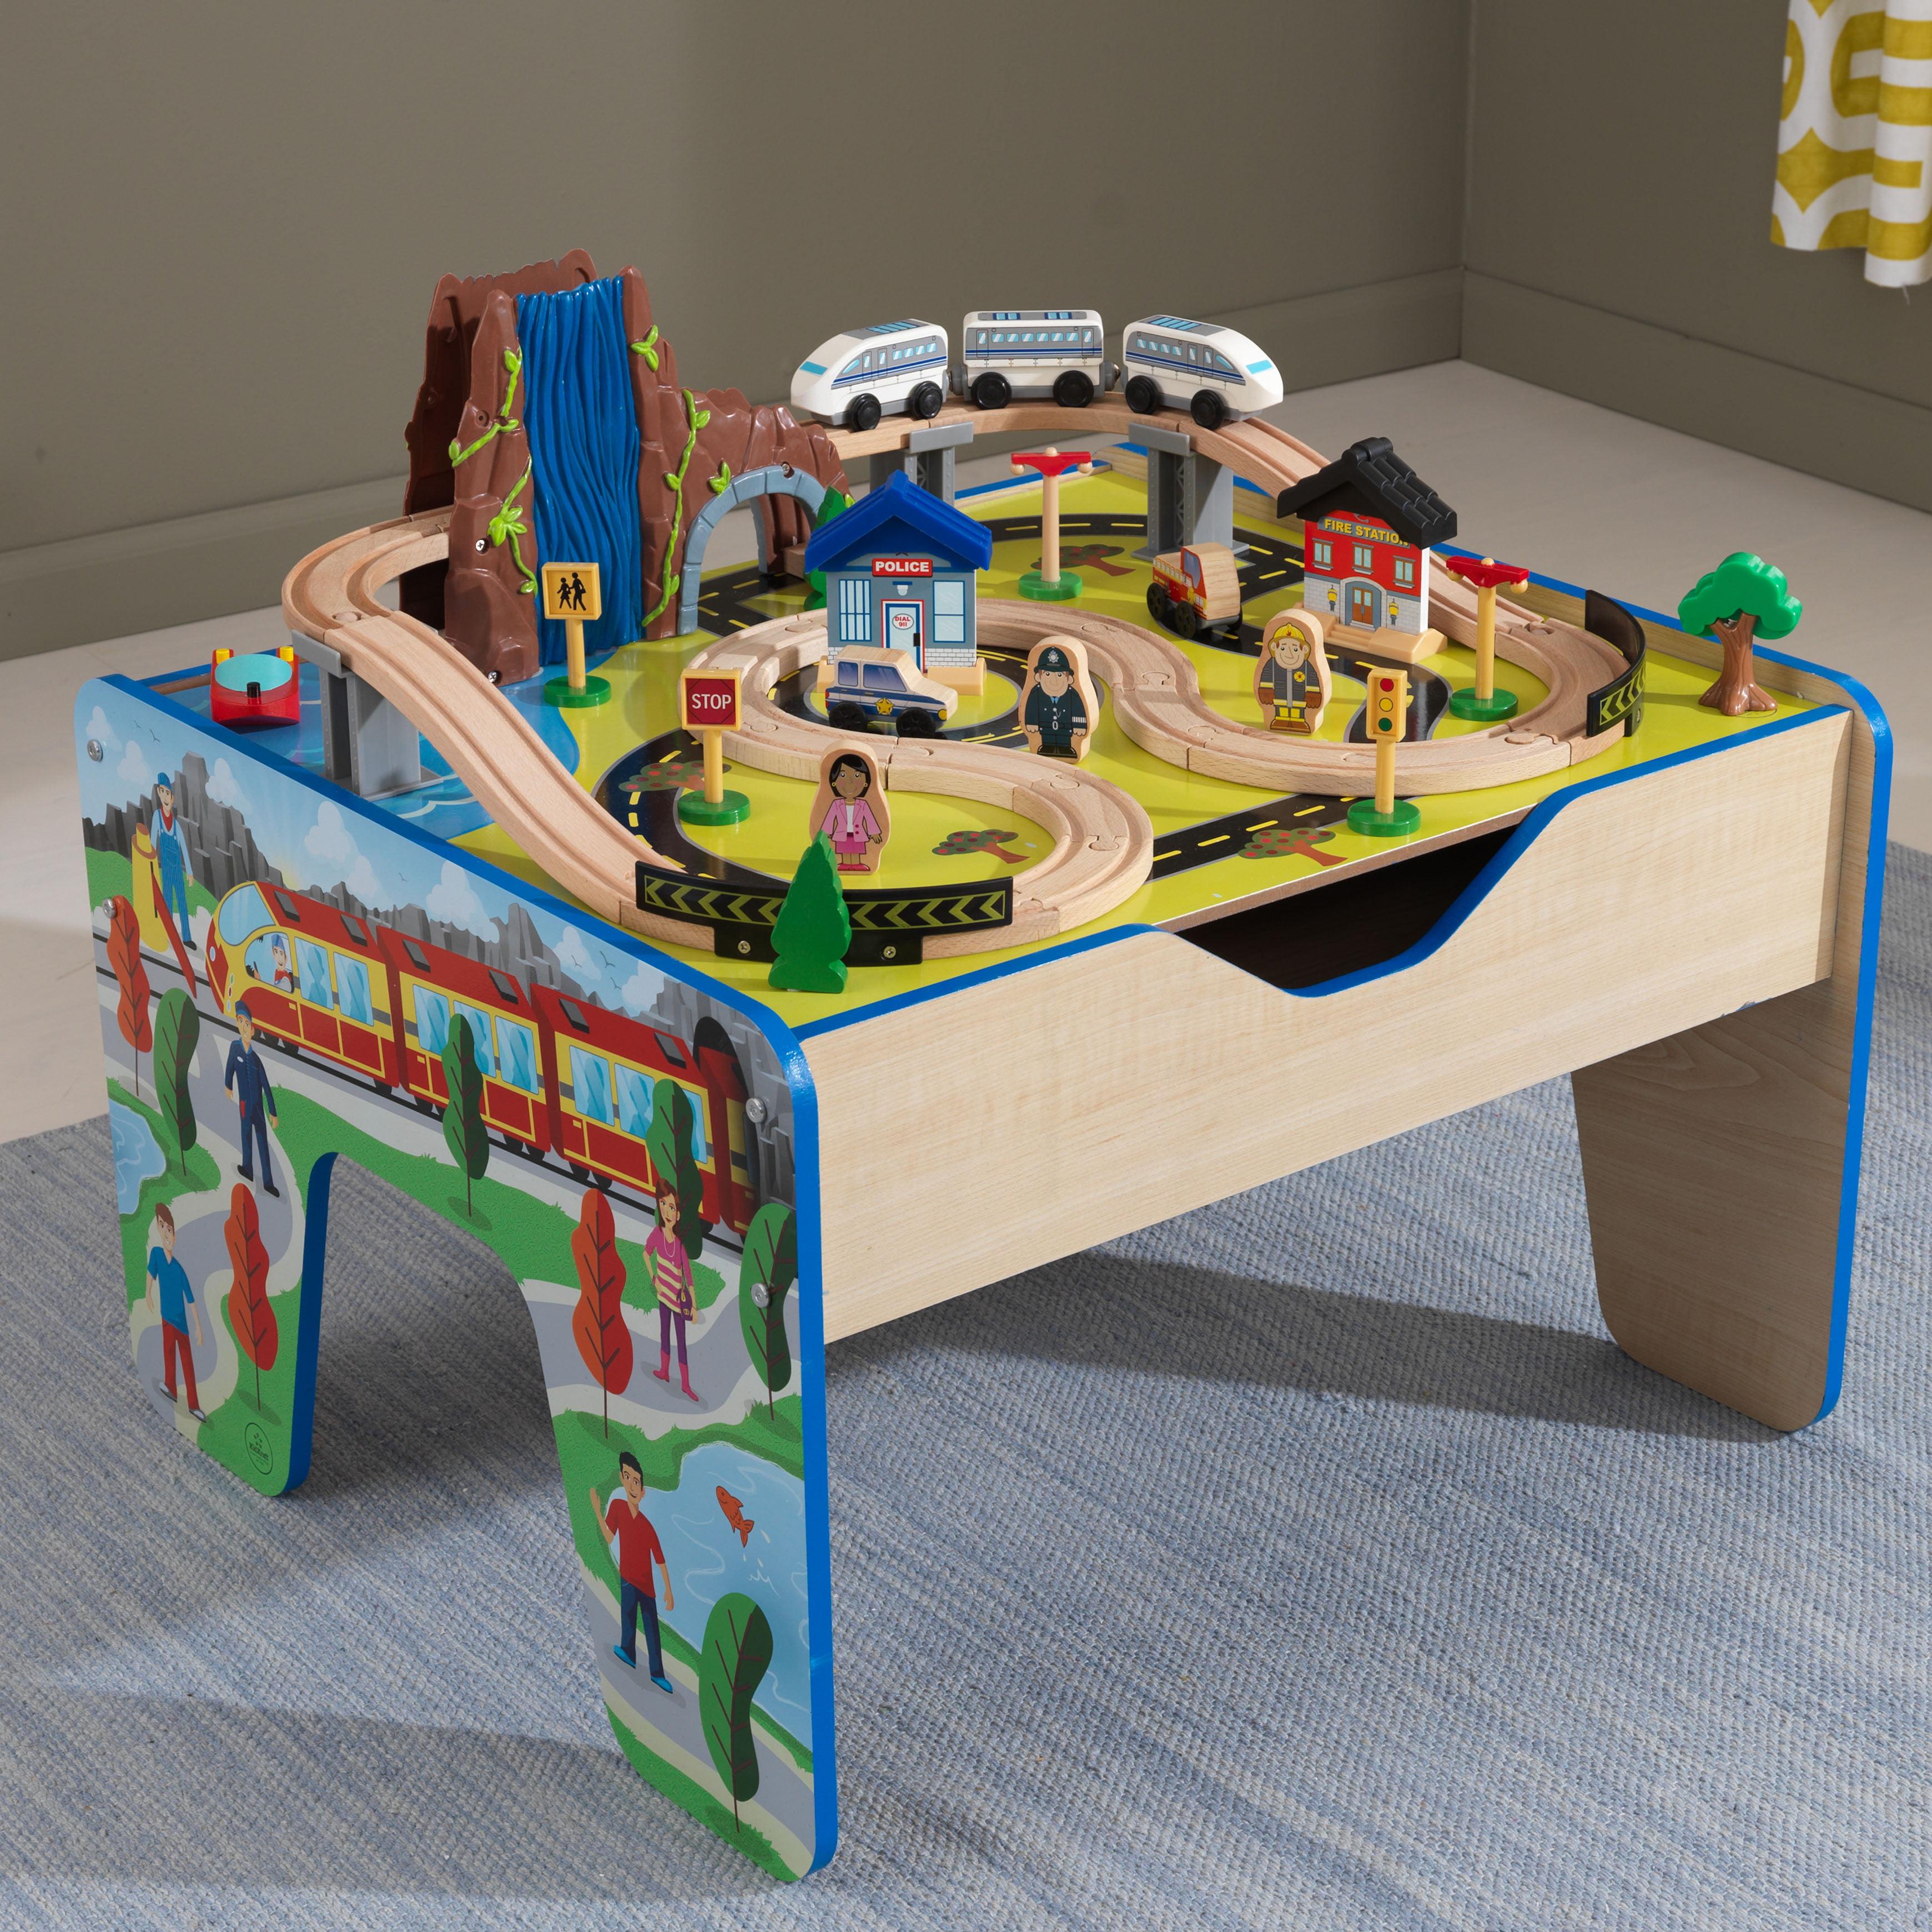 KidKraft Rapid Waterfall Train Set & Table with 48 accessories